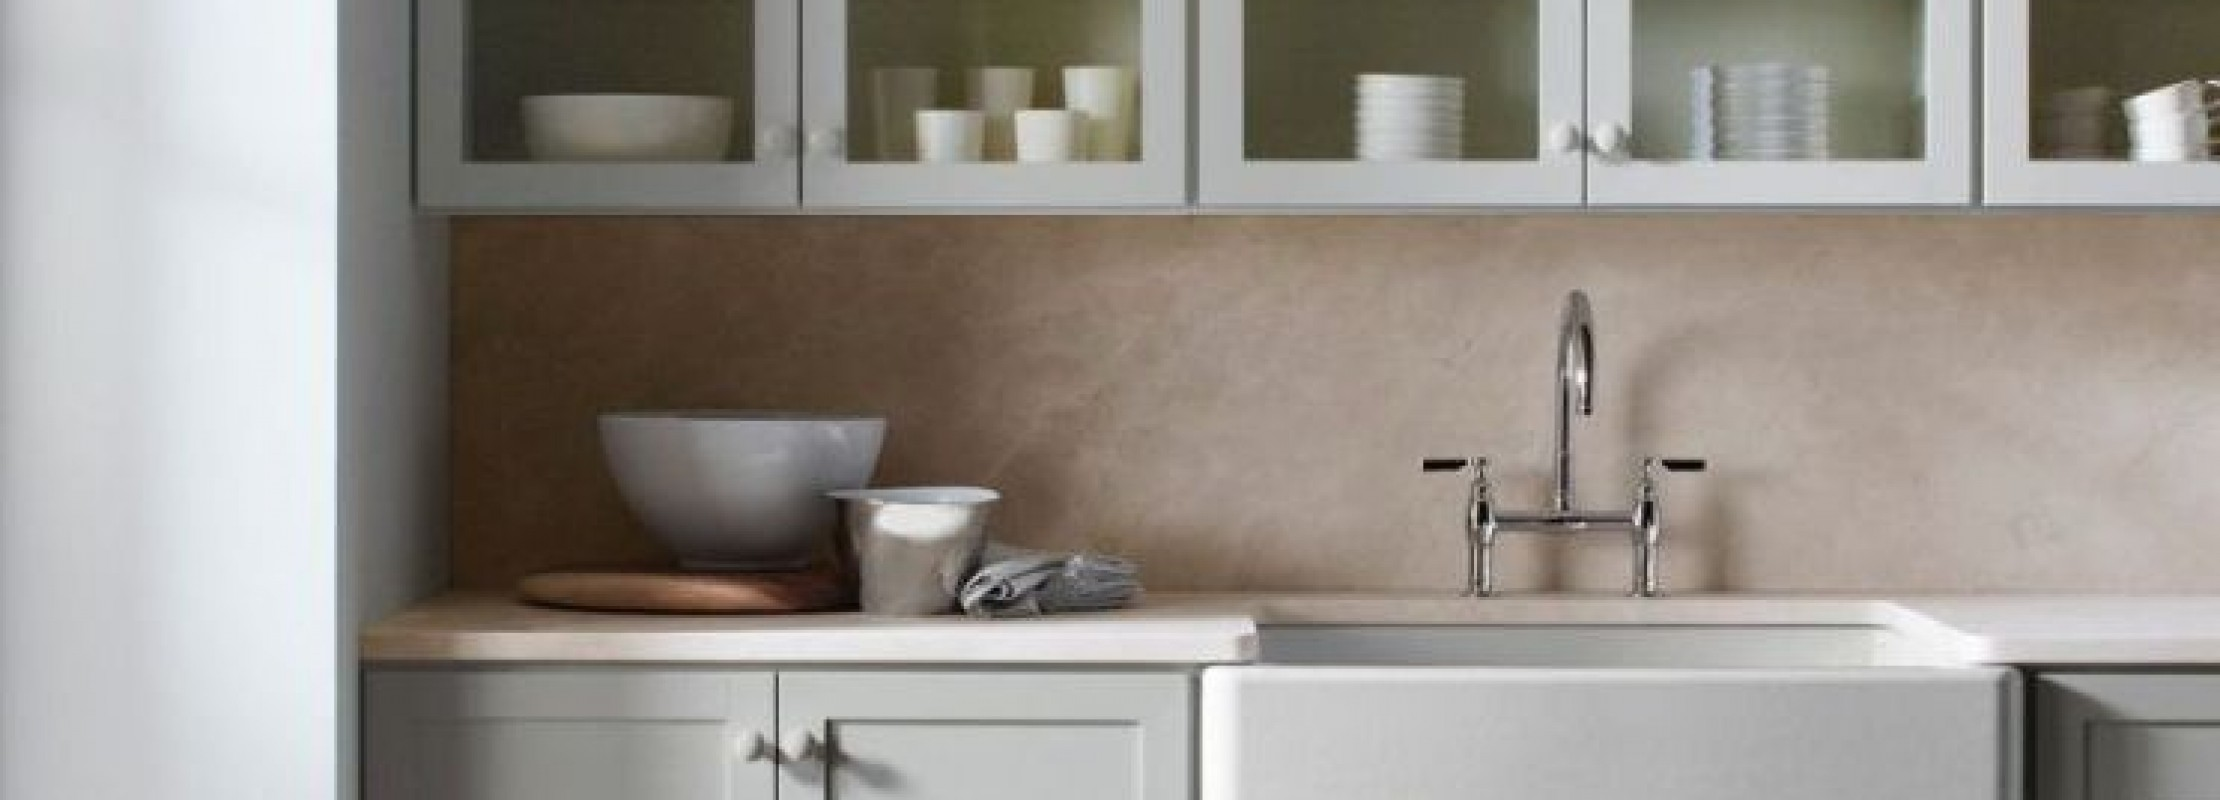 Sanitrit per cucina, consigli e prezzi | Blog Edilnet